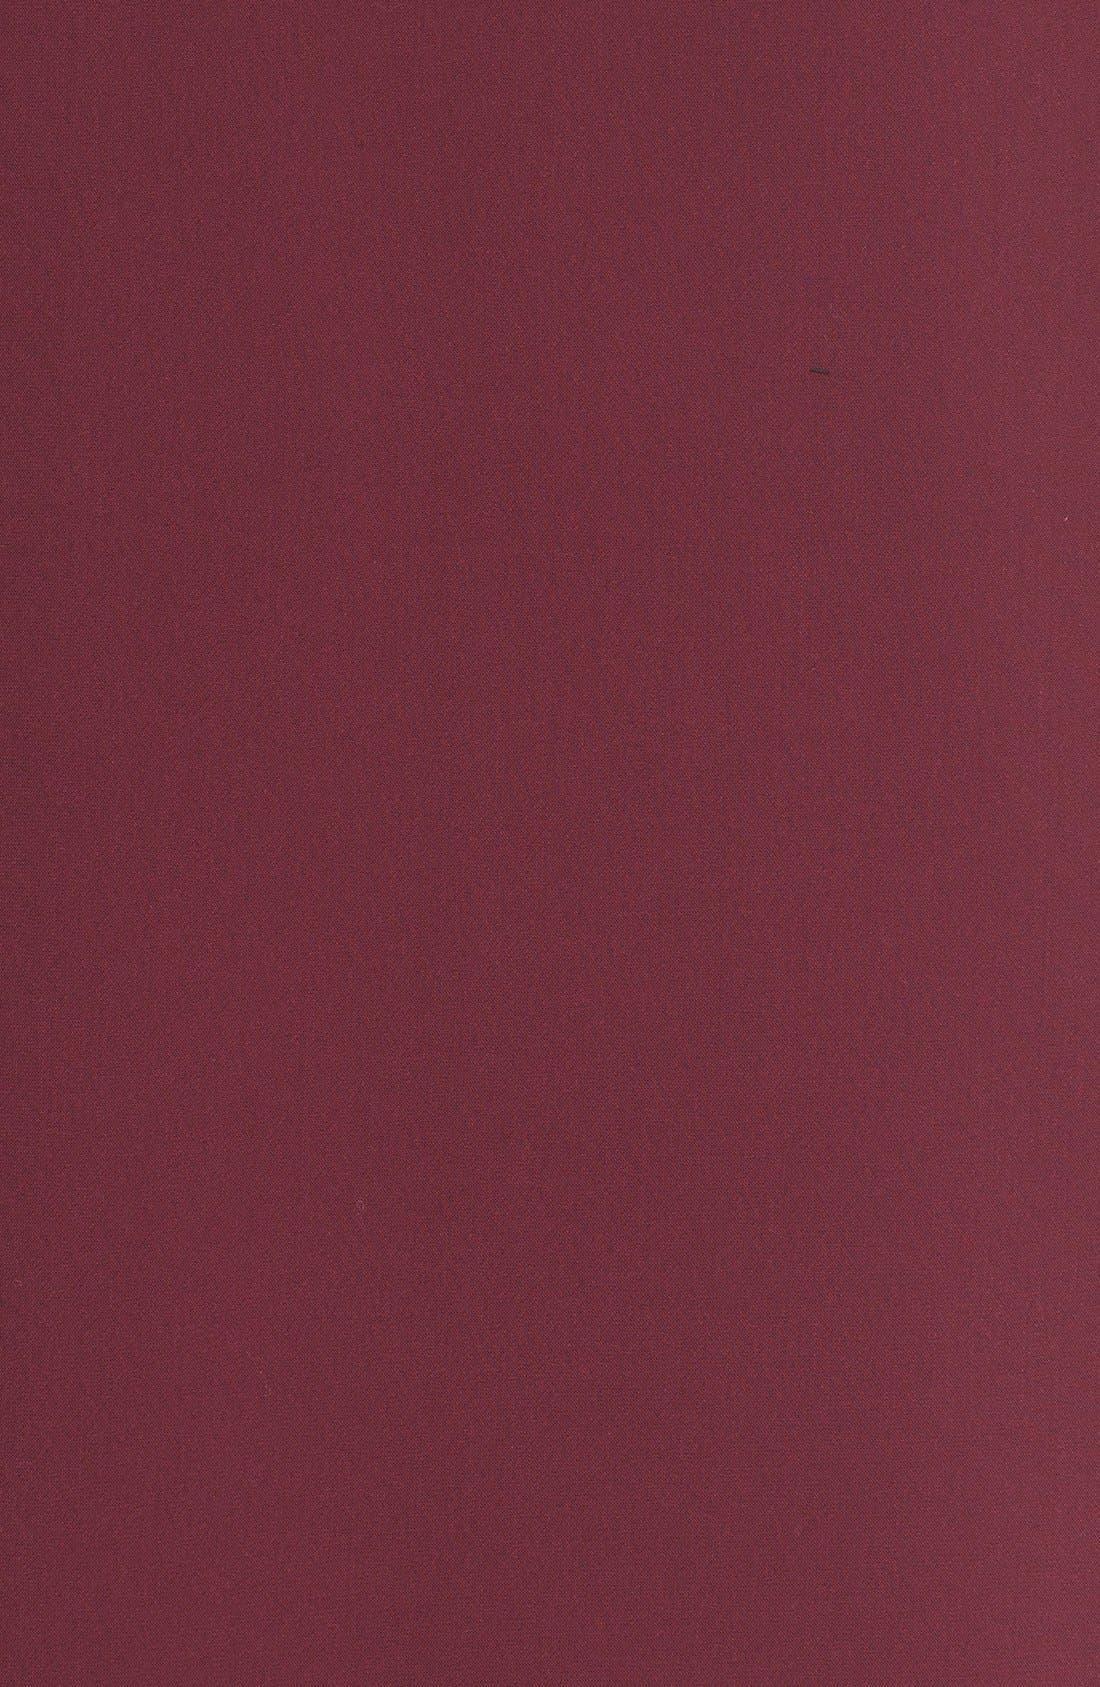 TED BAKER LONDON,                             'Maggyy' Ottoman Cape Blazer,                             Alternate thumbnail 3, color,                             602